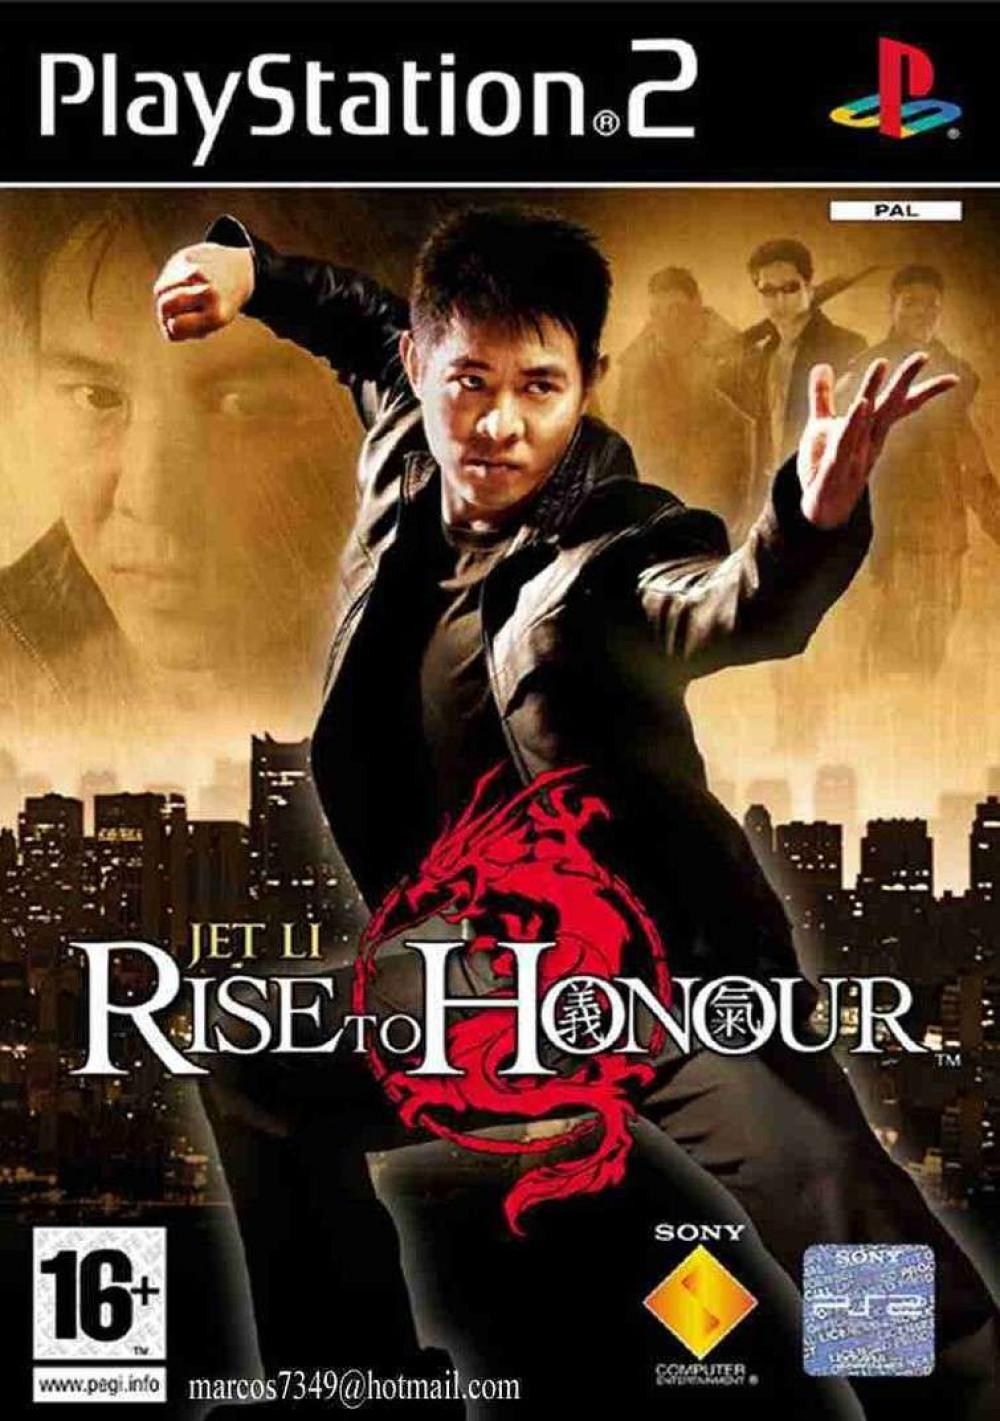 PS2 Jet Li Rise To Honour